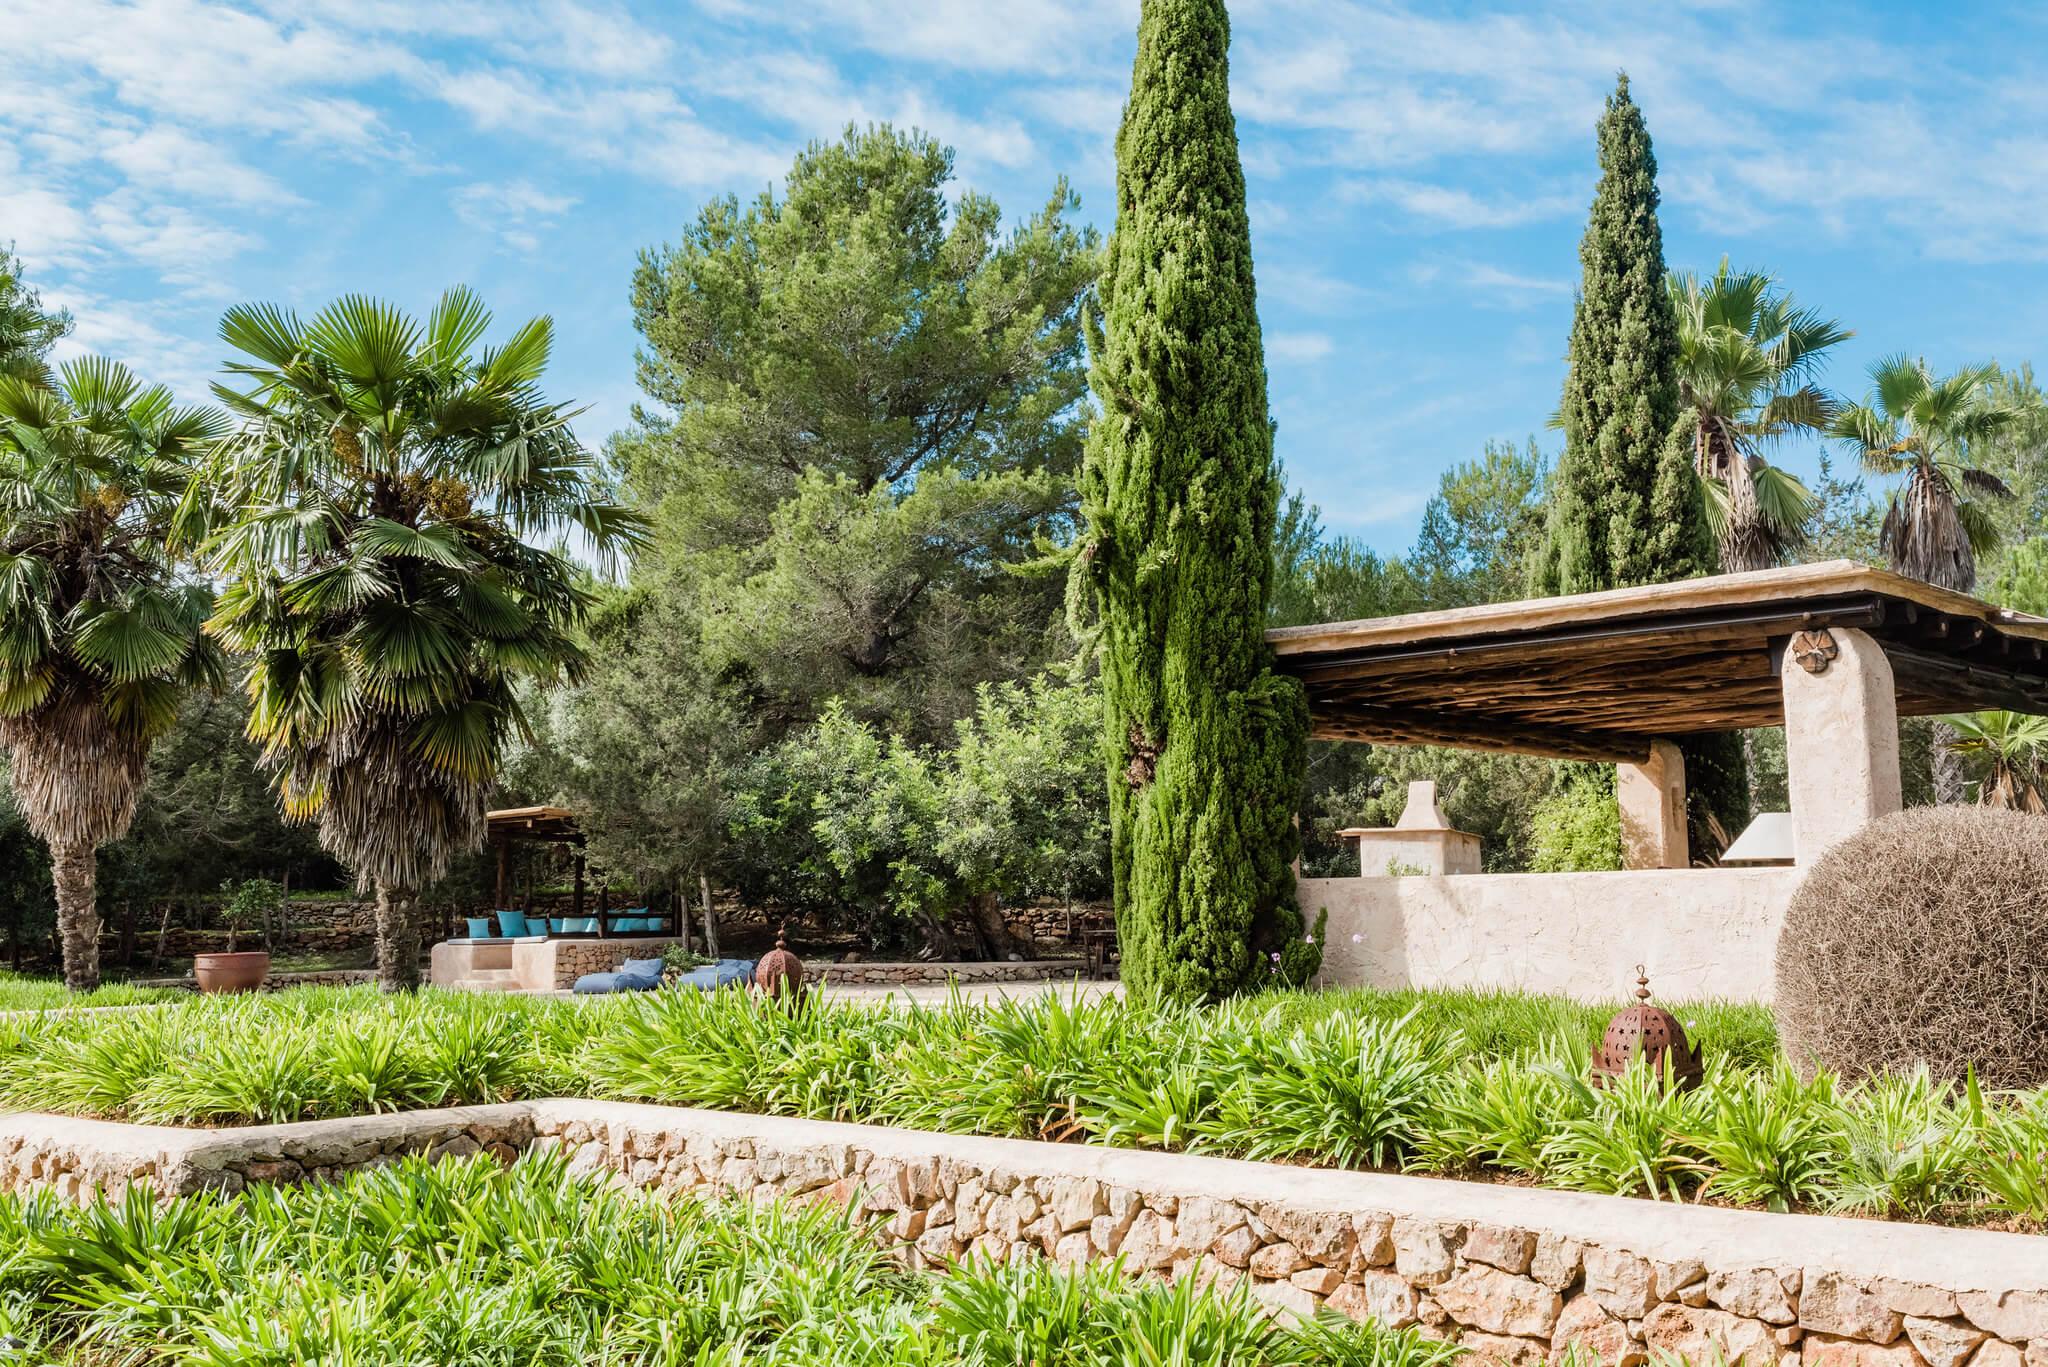 https://www.white-ibiza.com/wp-content/uploads/2020/05/white-ibiza-villas-can-sabina-exterior-garden.jpg